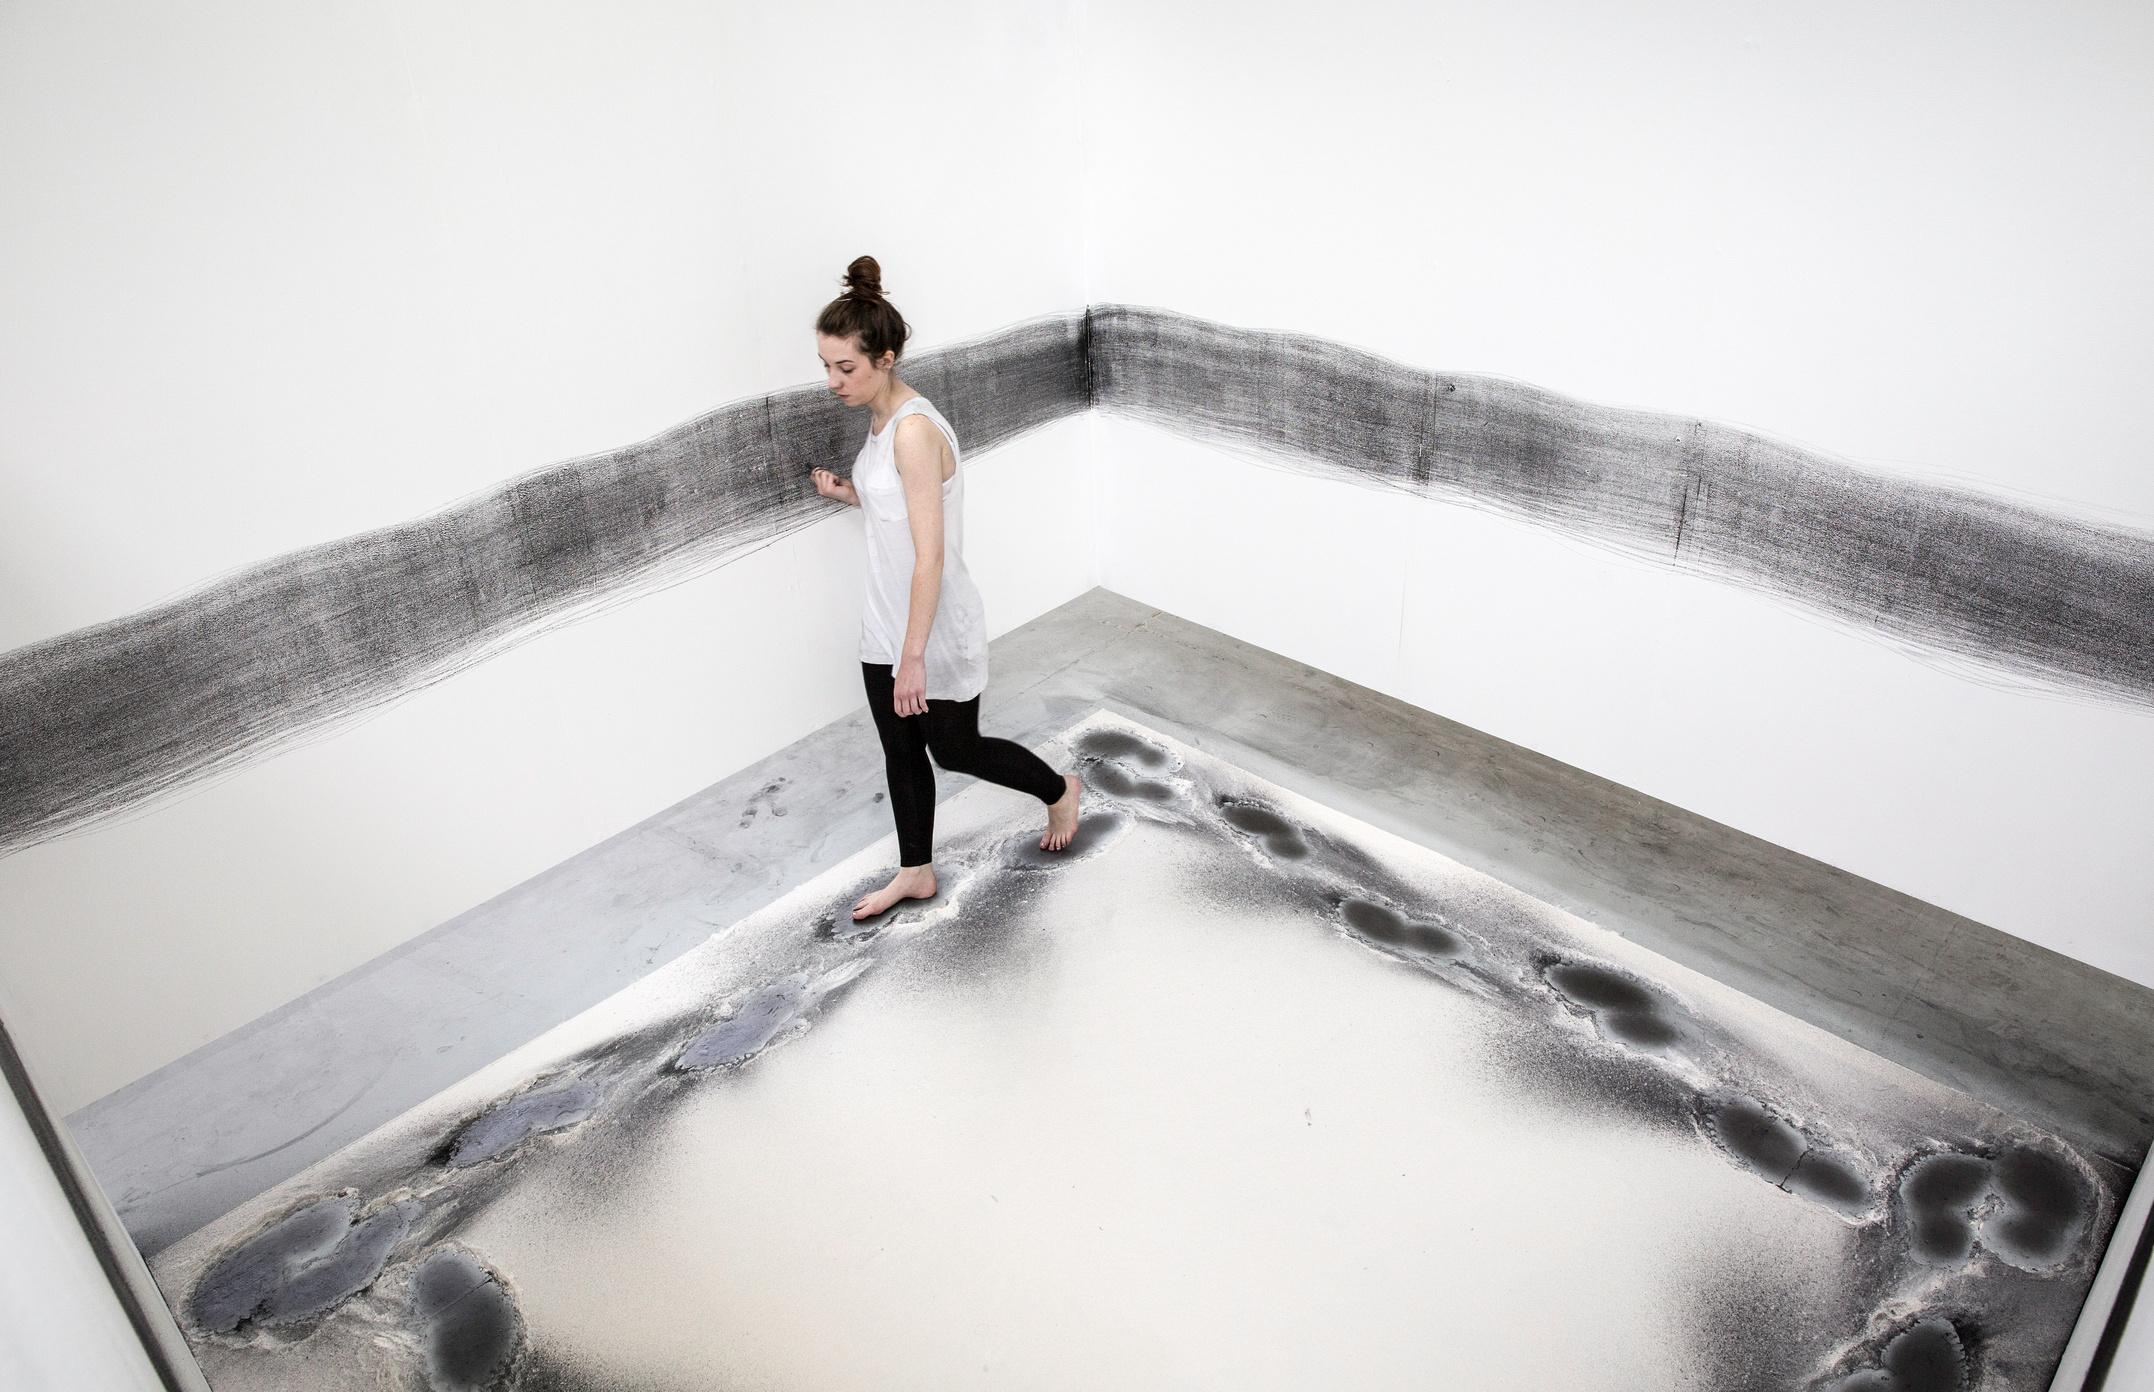 Kirstin Clark with her artwork